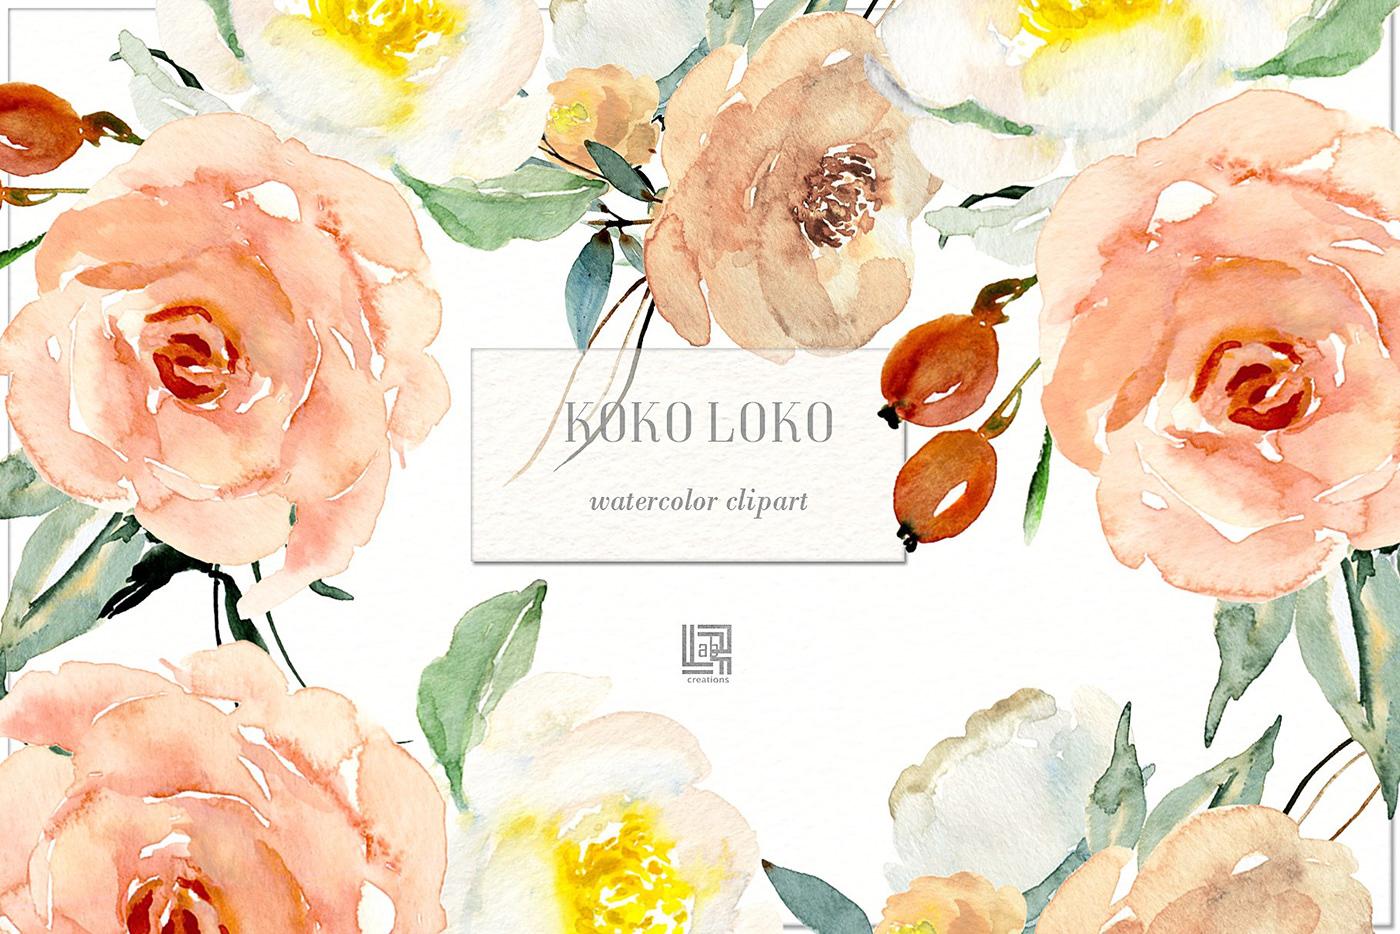 Koko Loko. Watercolor floral clipart FREE DOWNLOAD! on Behance.